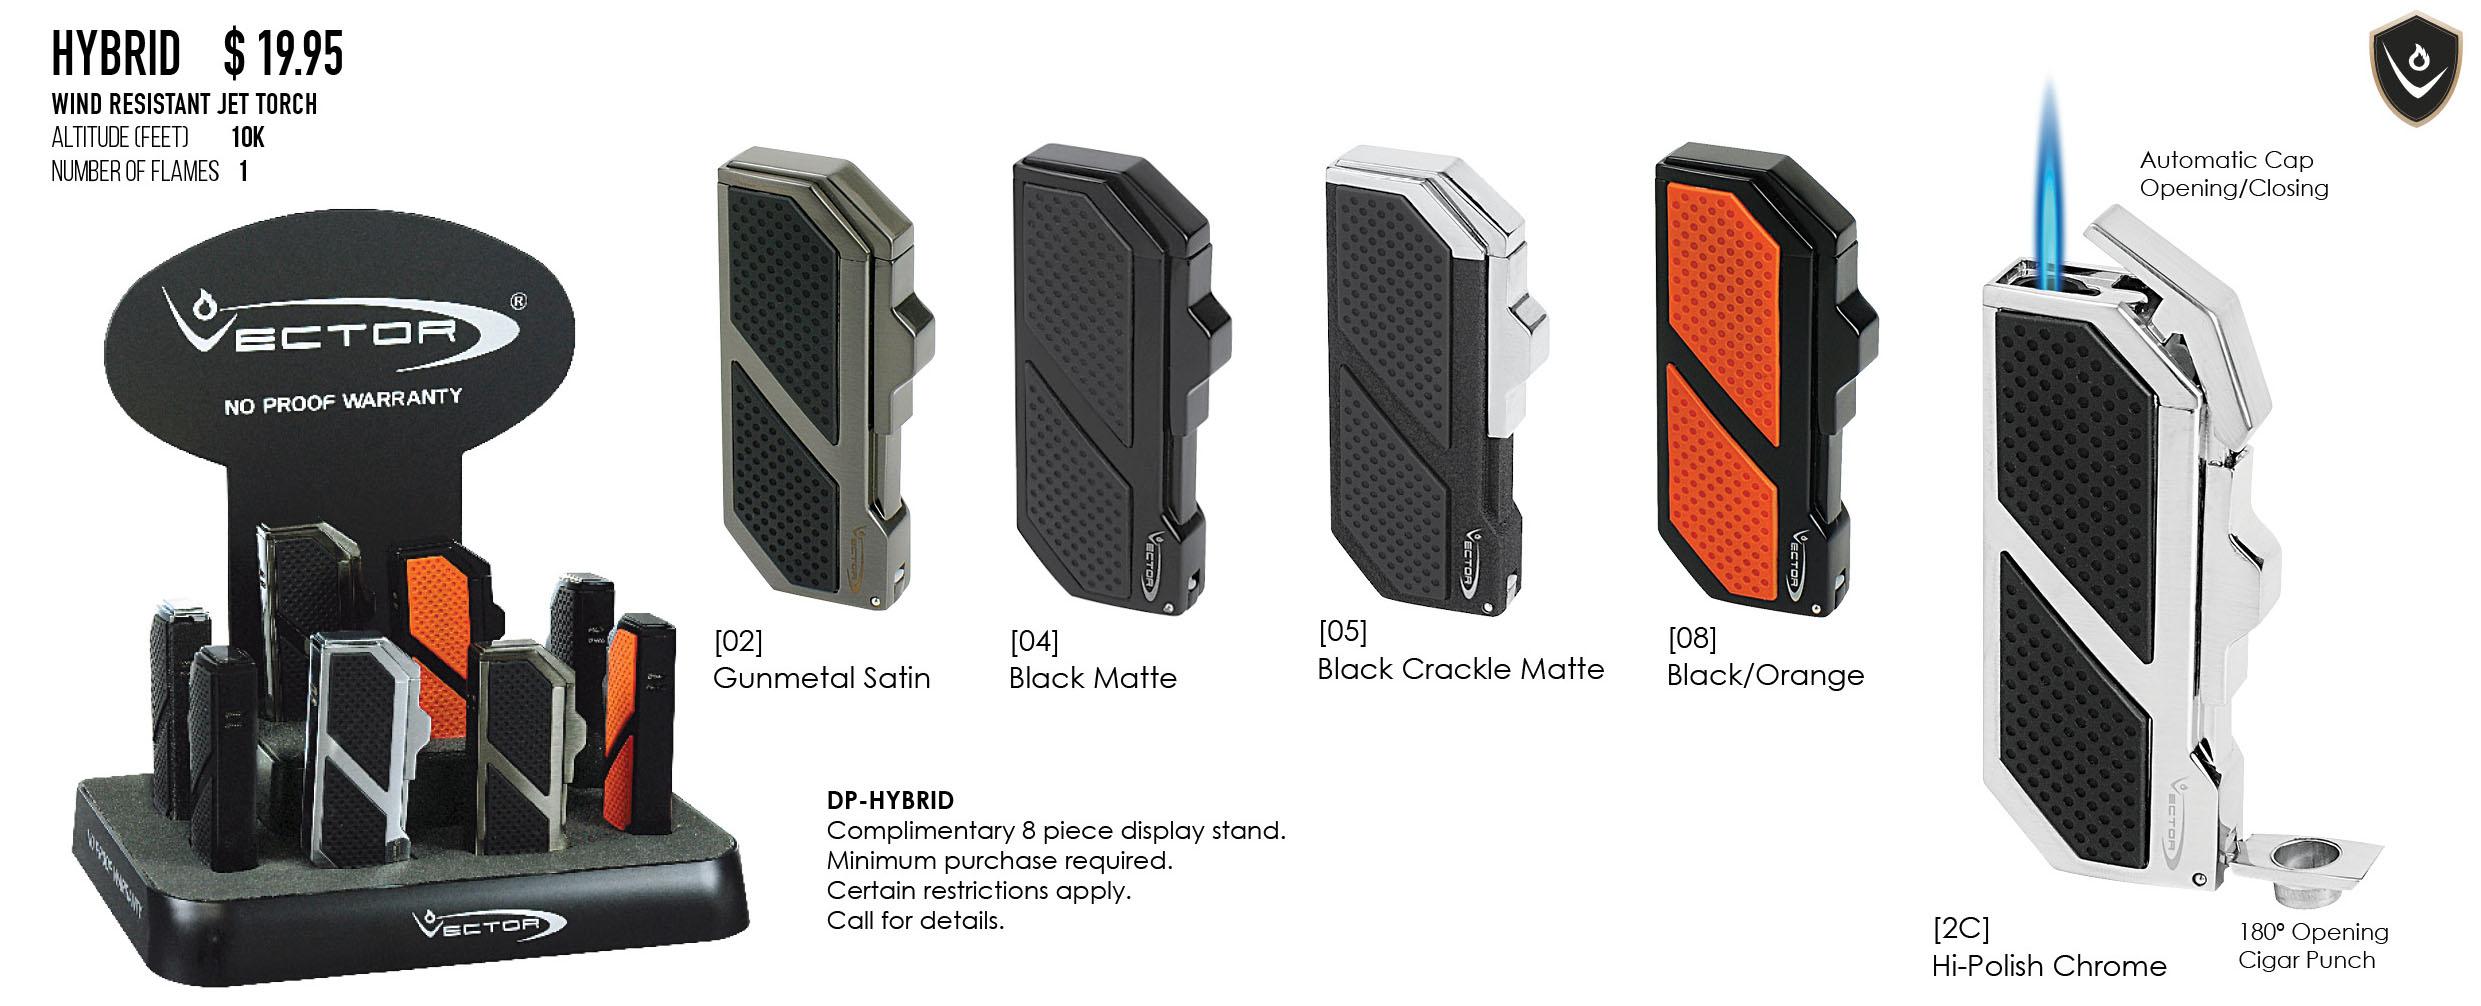 2481x1006 Pocket Lighters Single Torch Hybrid Vectorkgm